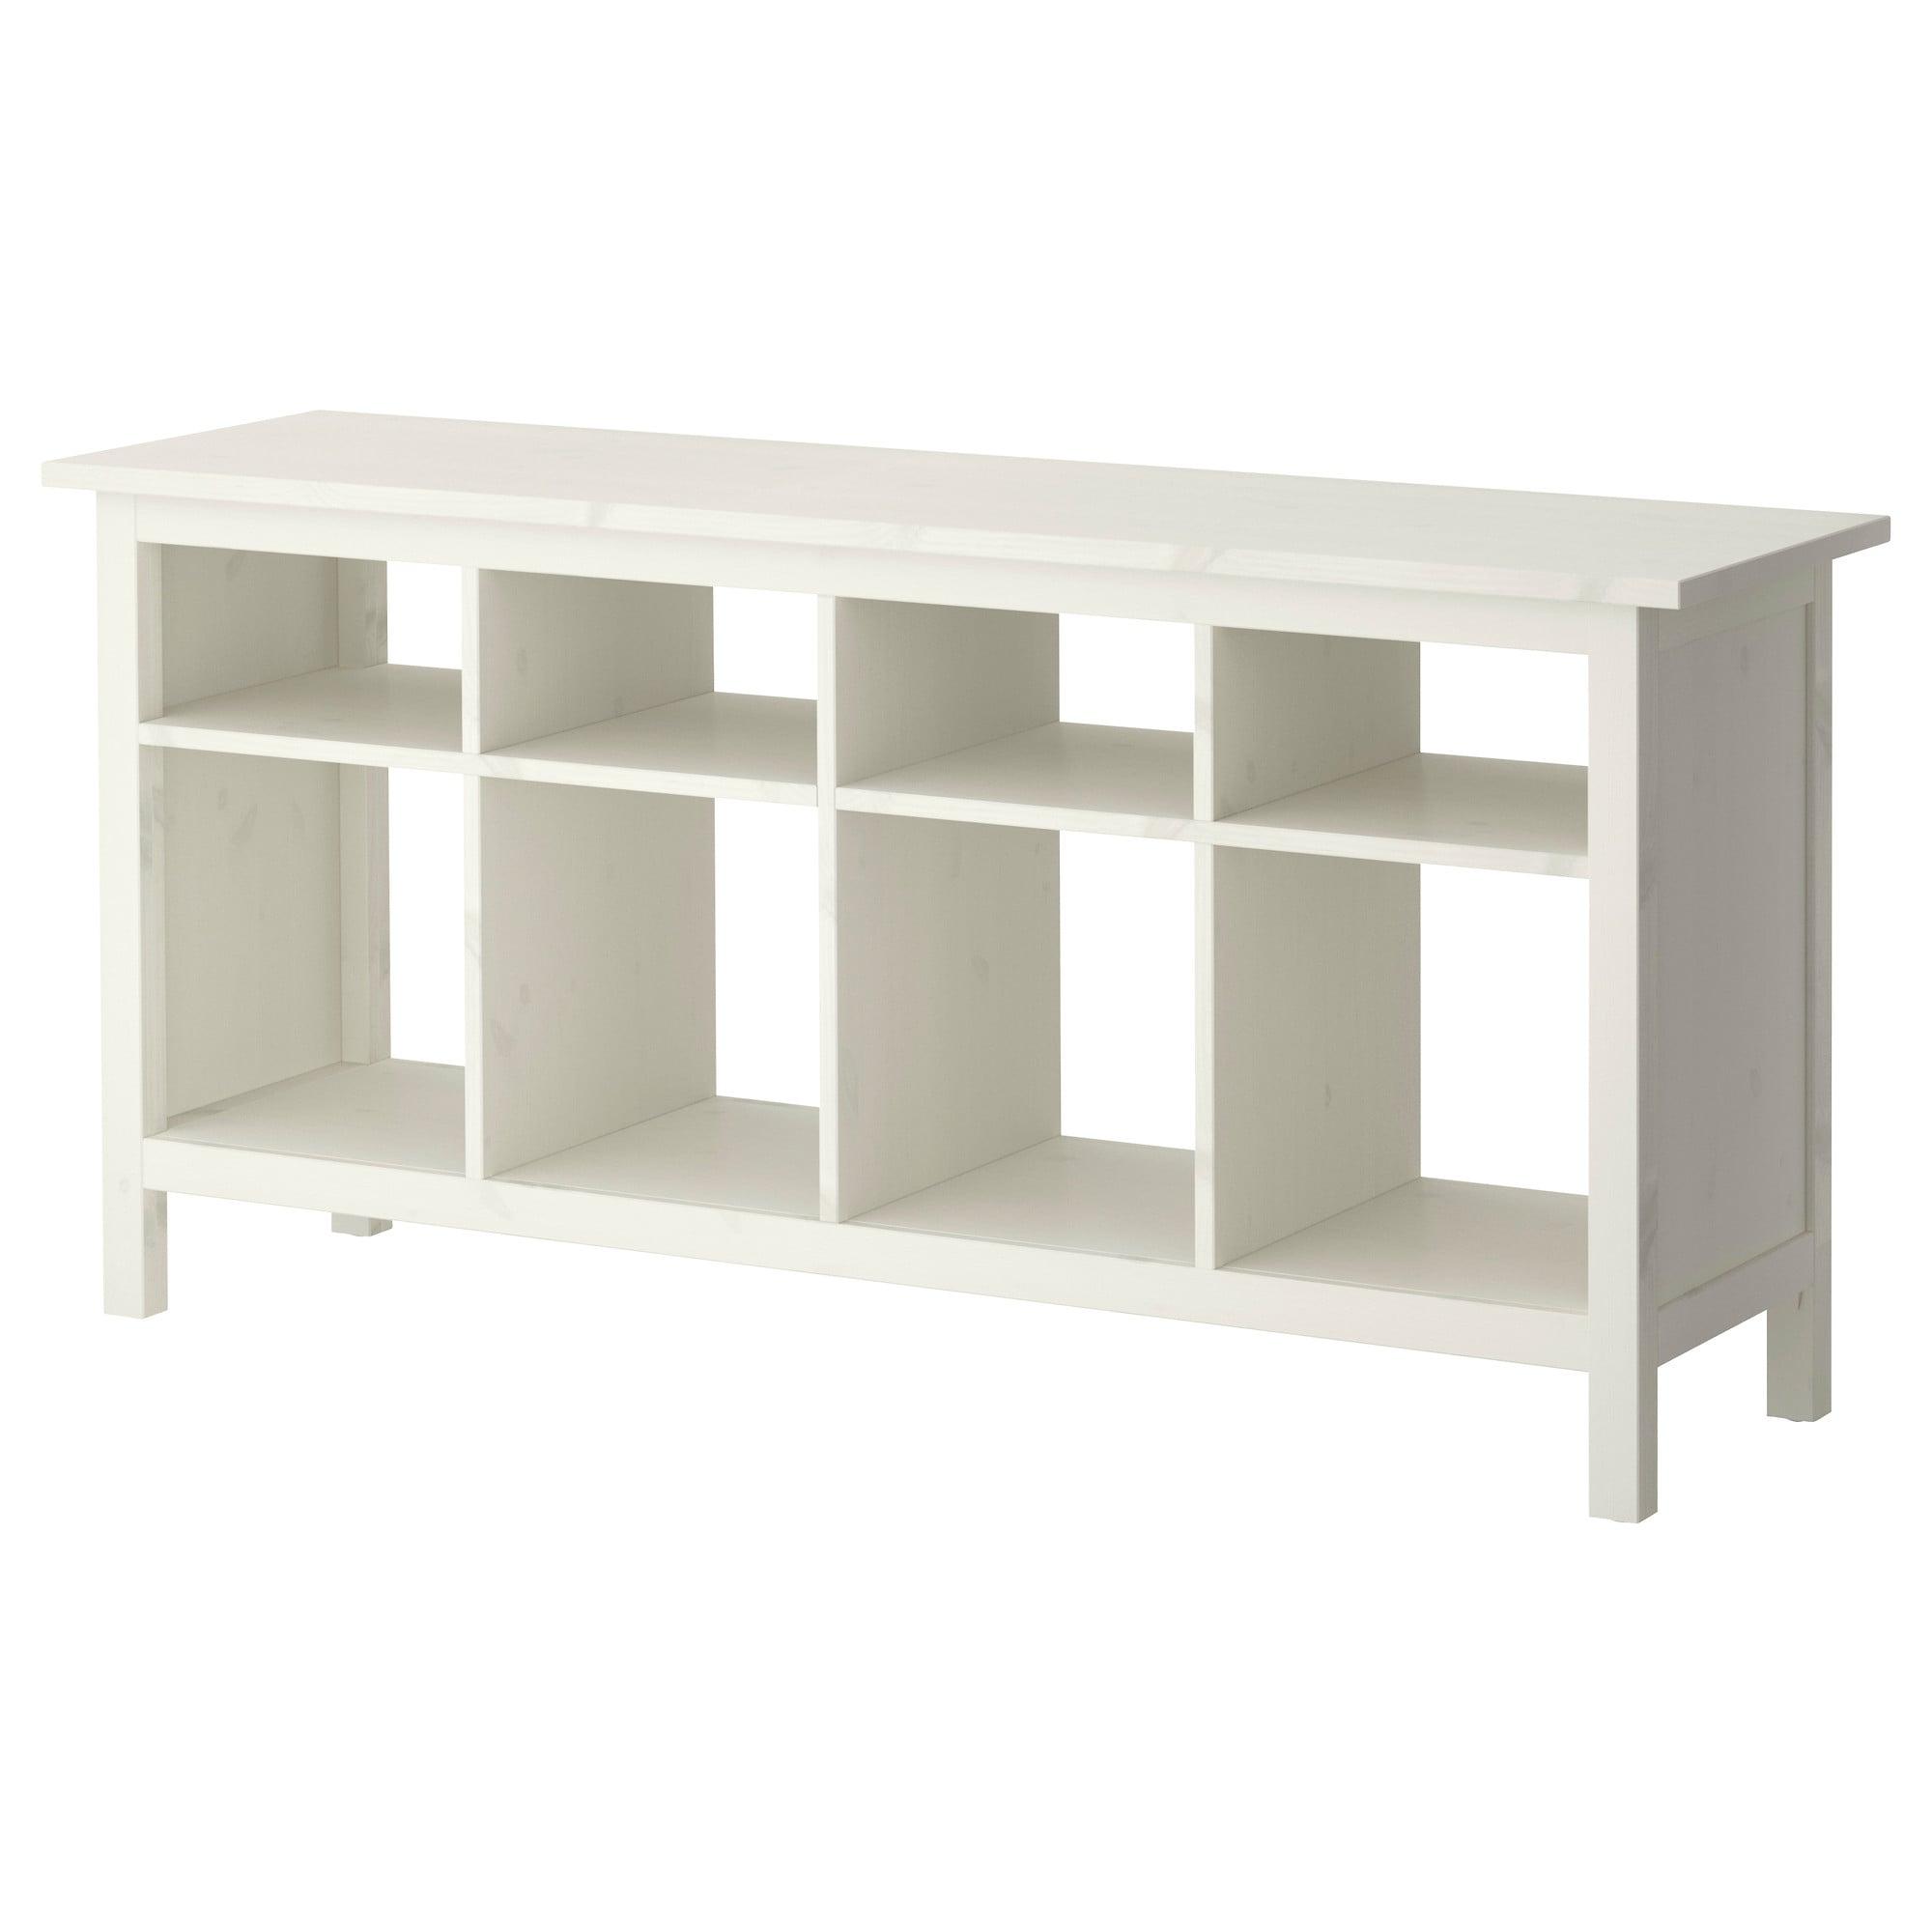 Hemnes Sidetable Wit Gebeitst 157x40 Cm Ikea Sofa Table Ikea Sofa Dining Storage